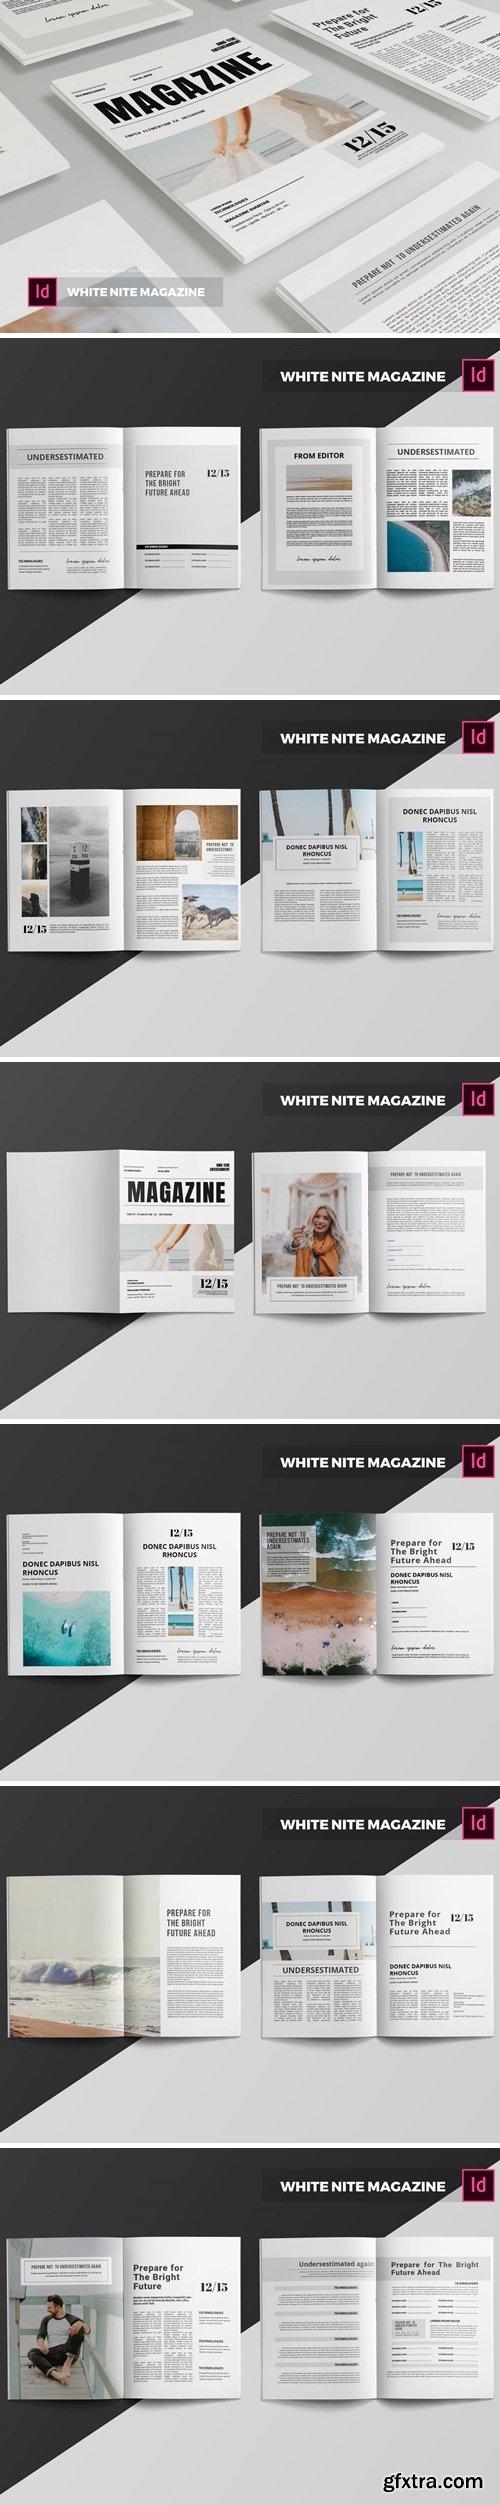 White Nite   Magazine Template